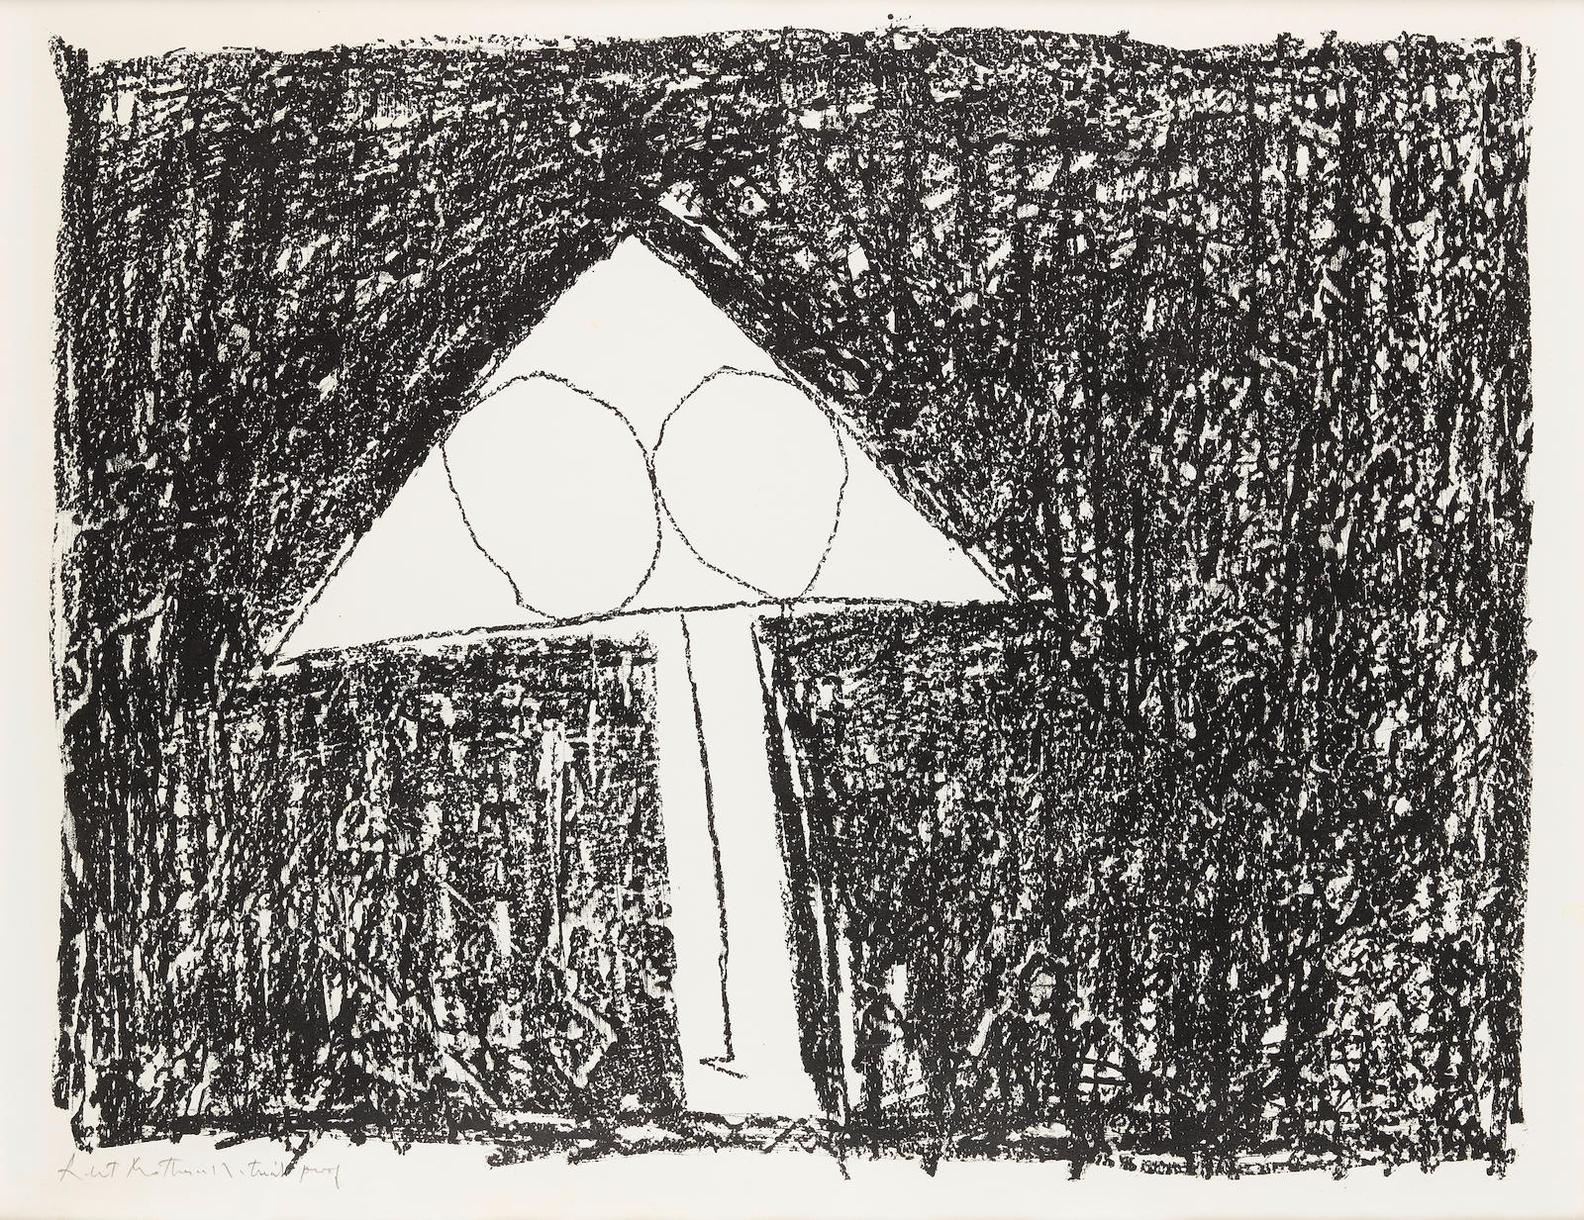 Robert Motherwell-Madrid Suite F (B. 14)-1966